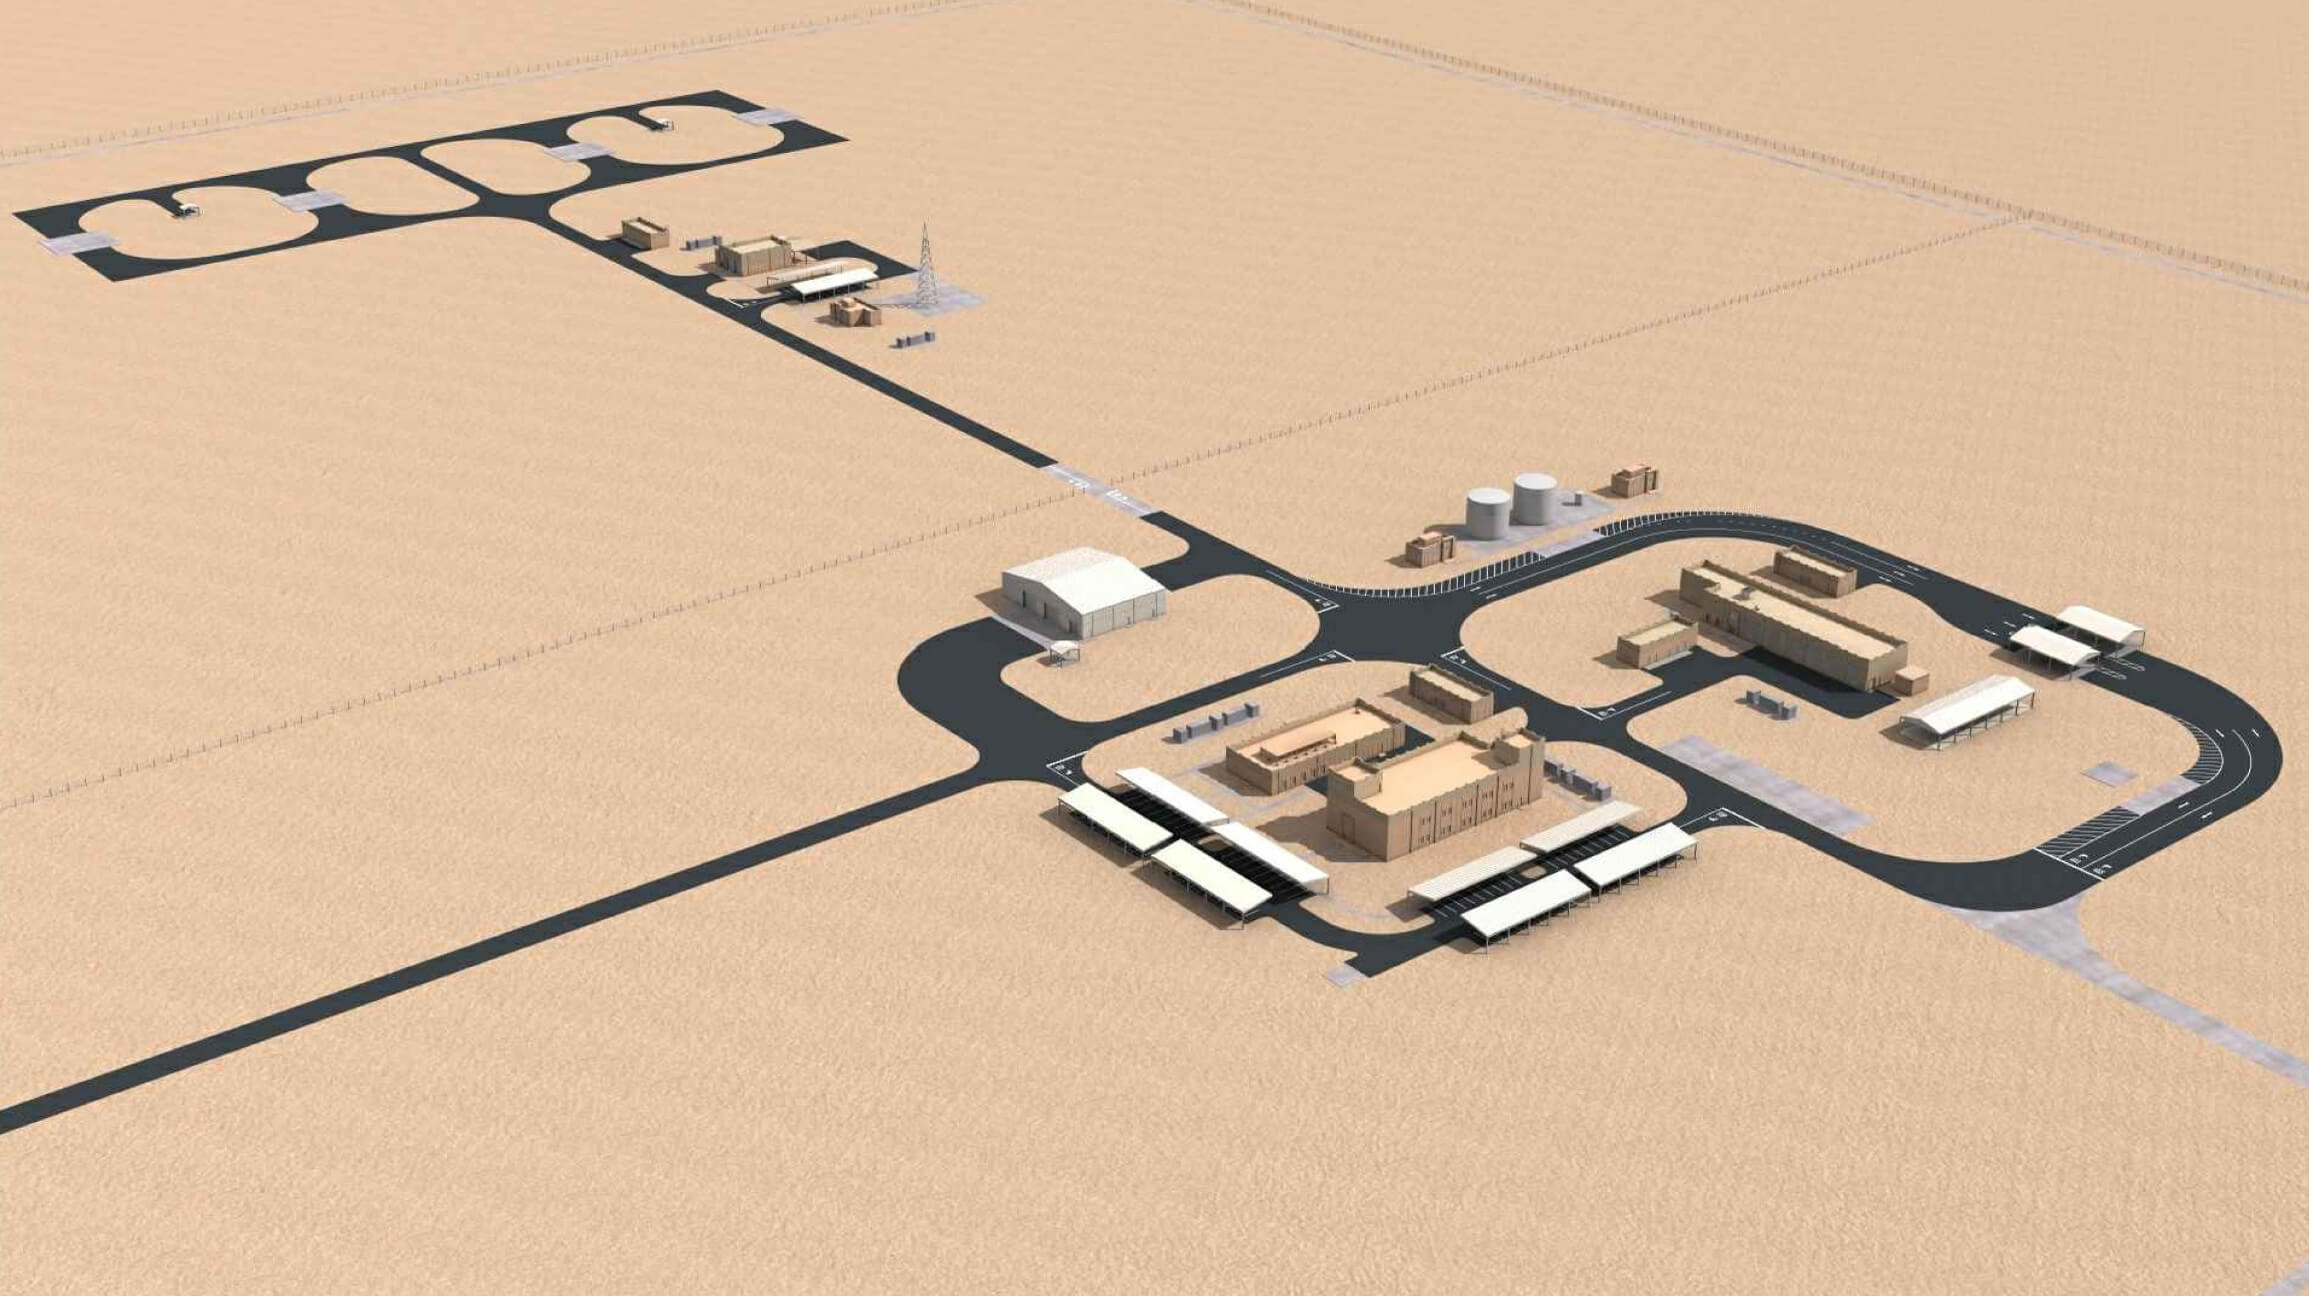 Qatar Shield 5 Program – Site 3